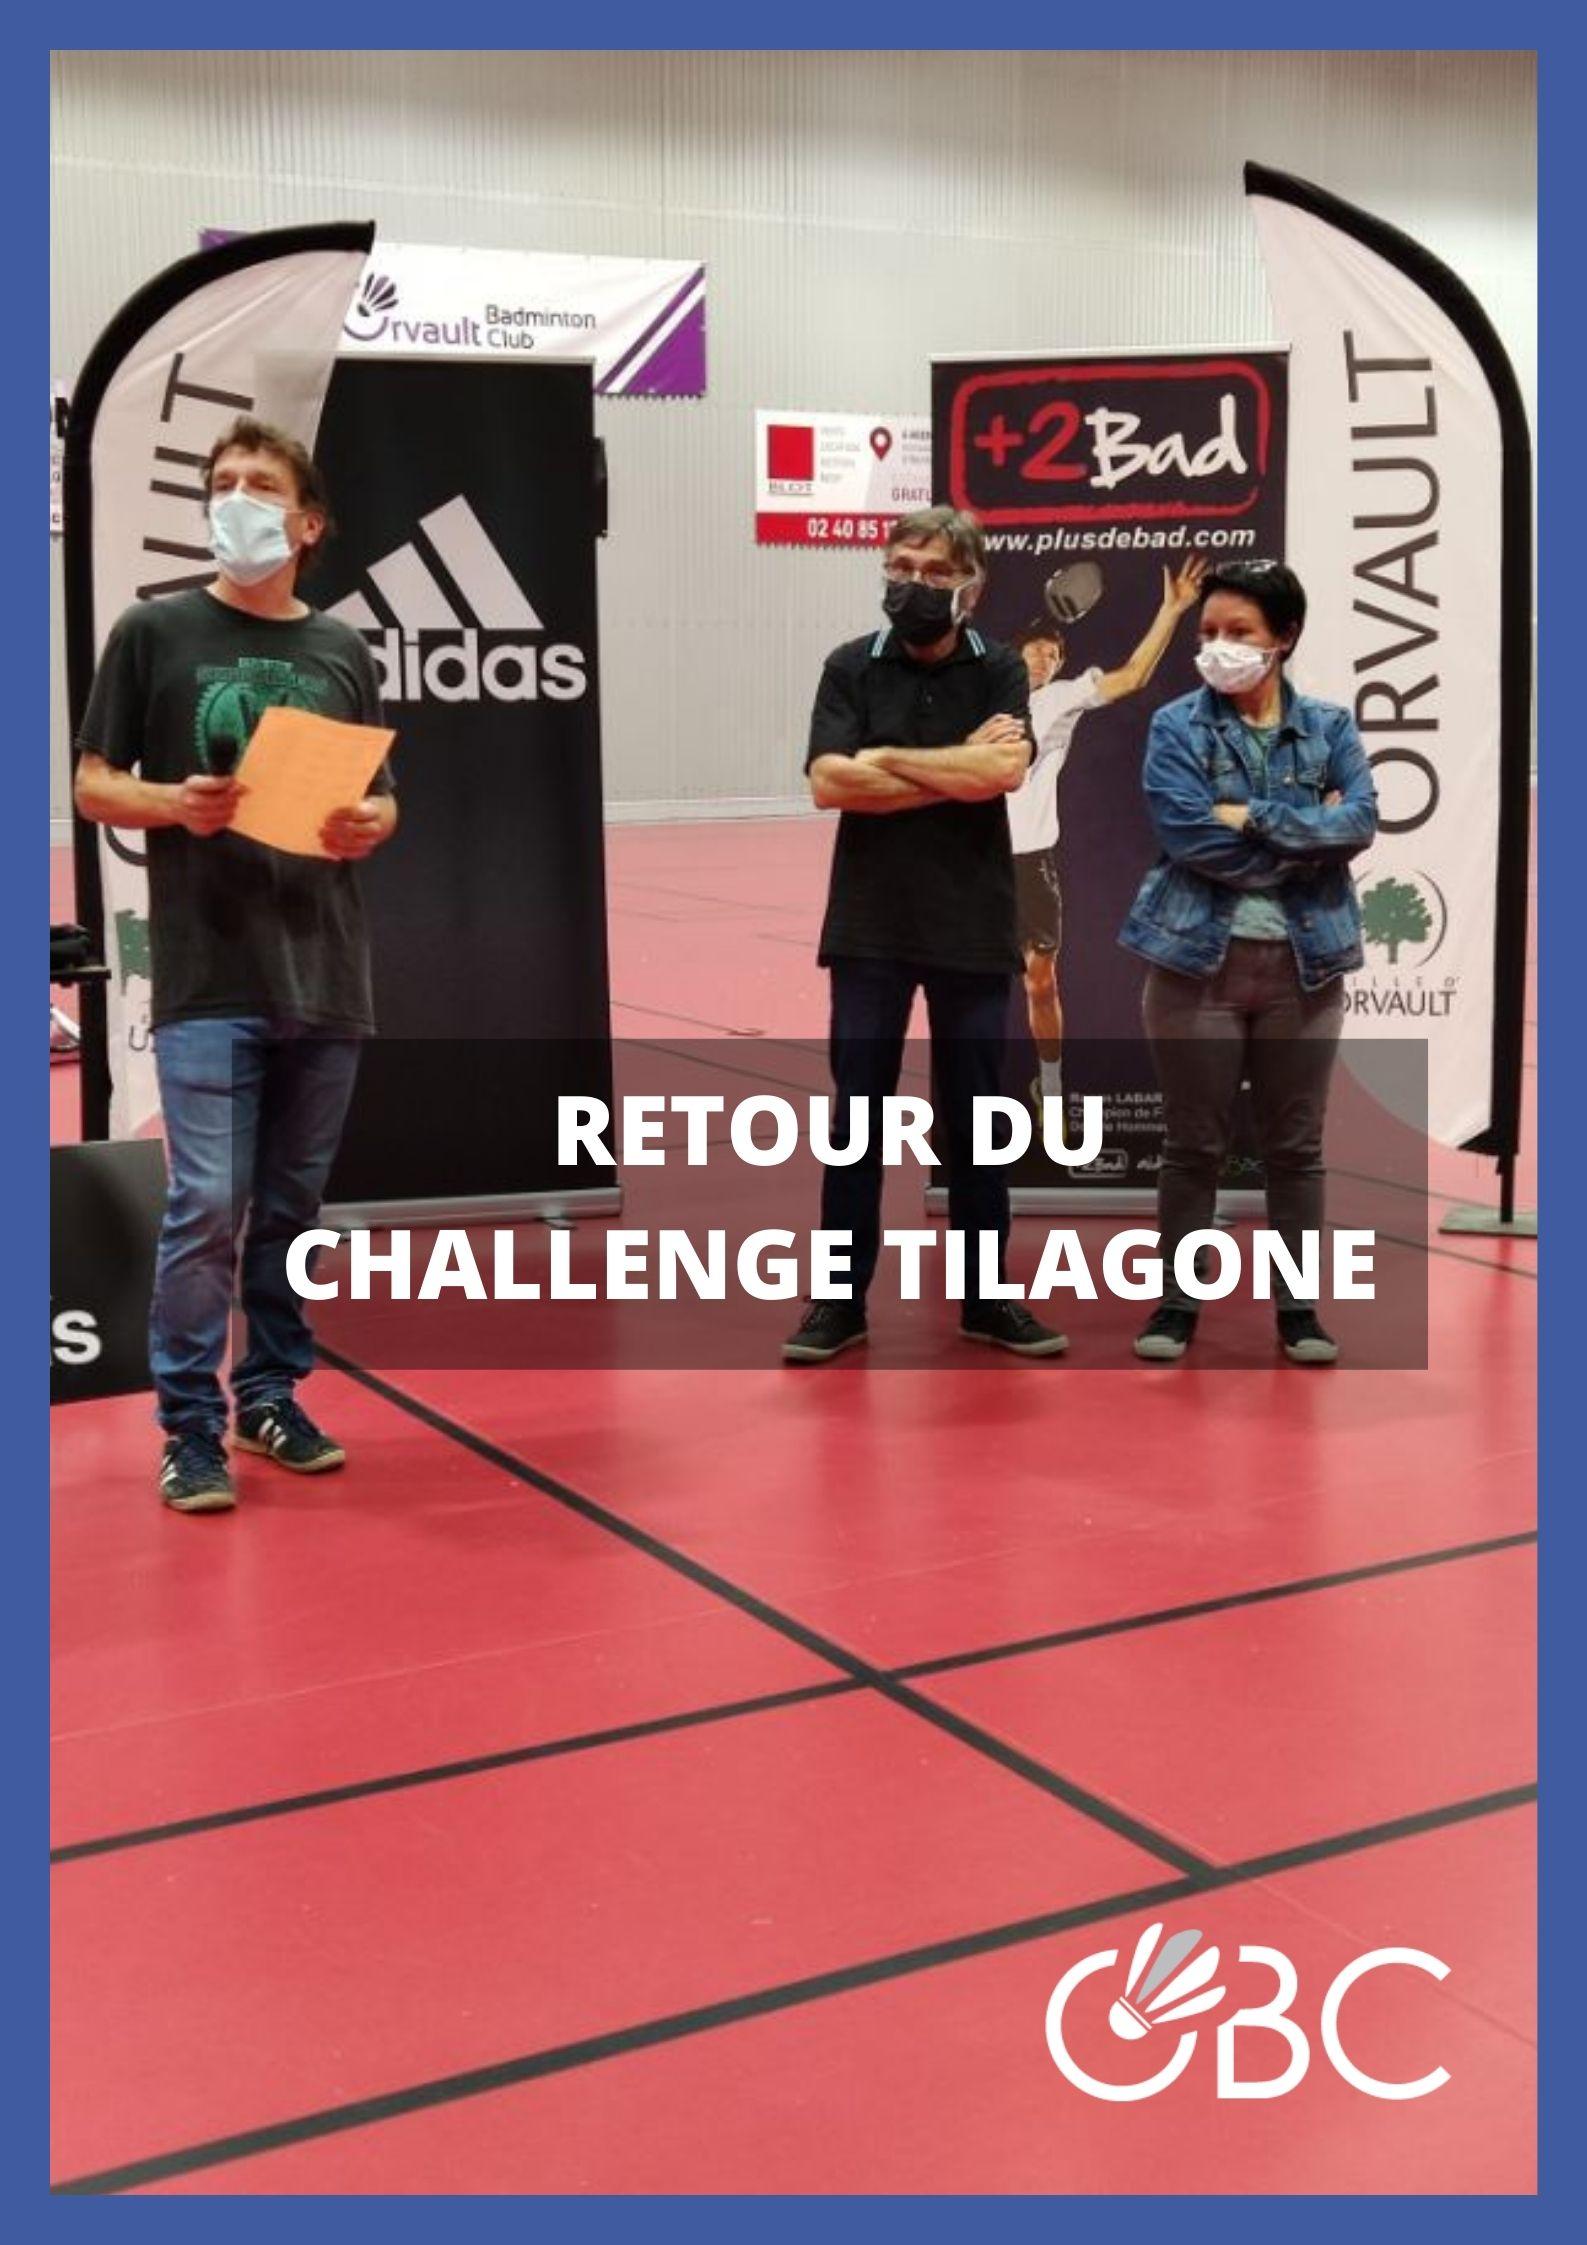 Retour du Challenge Tilagone !